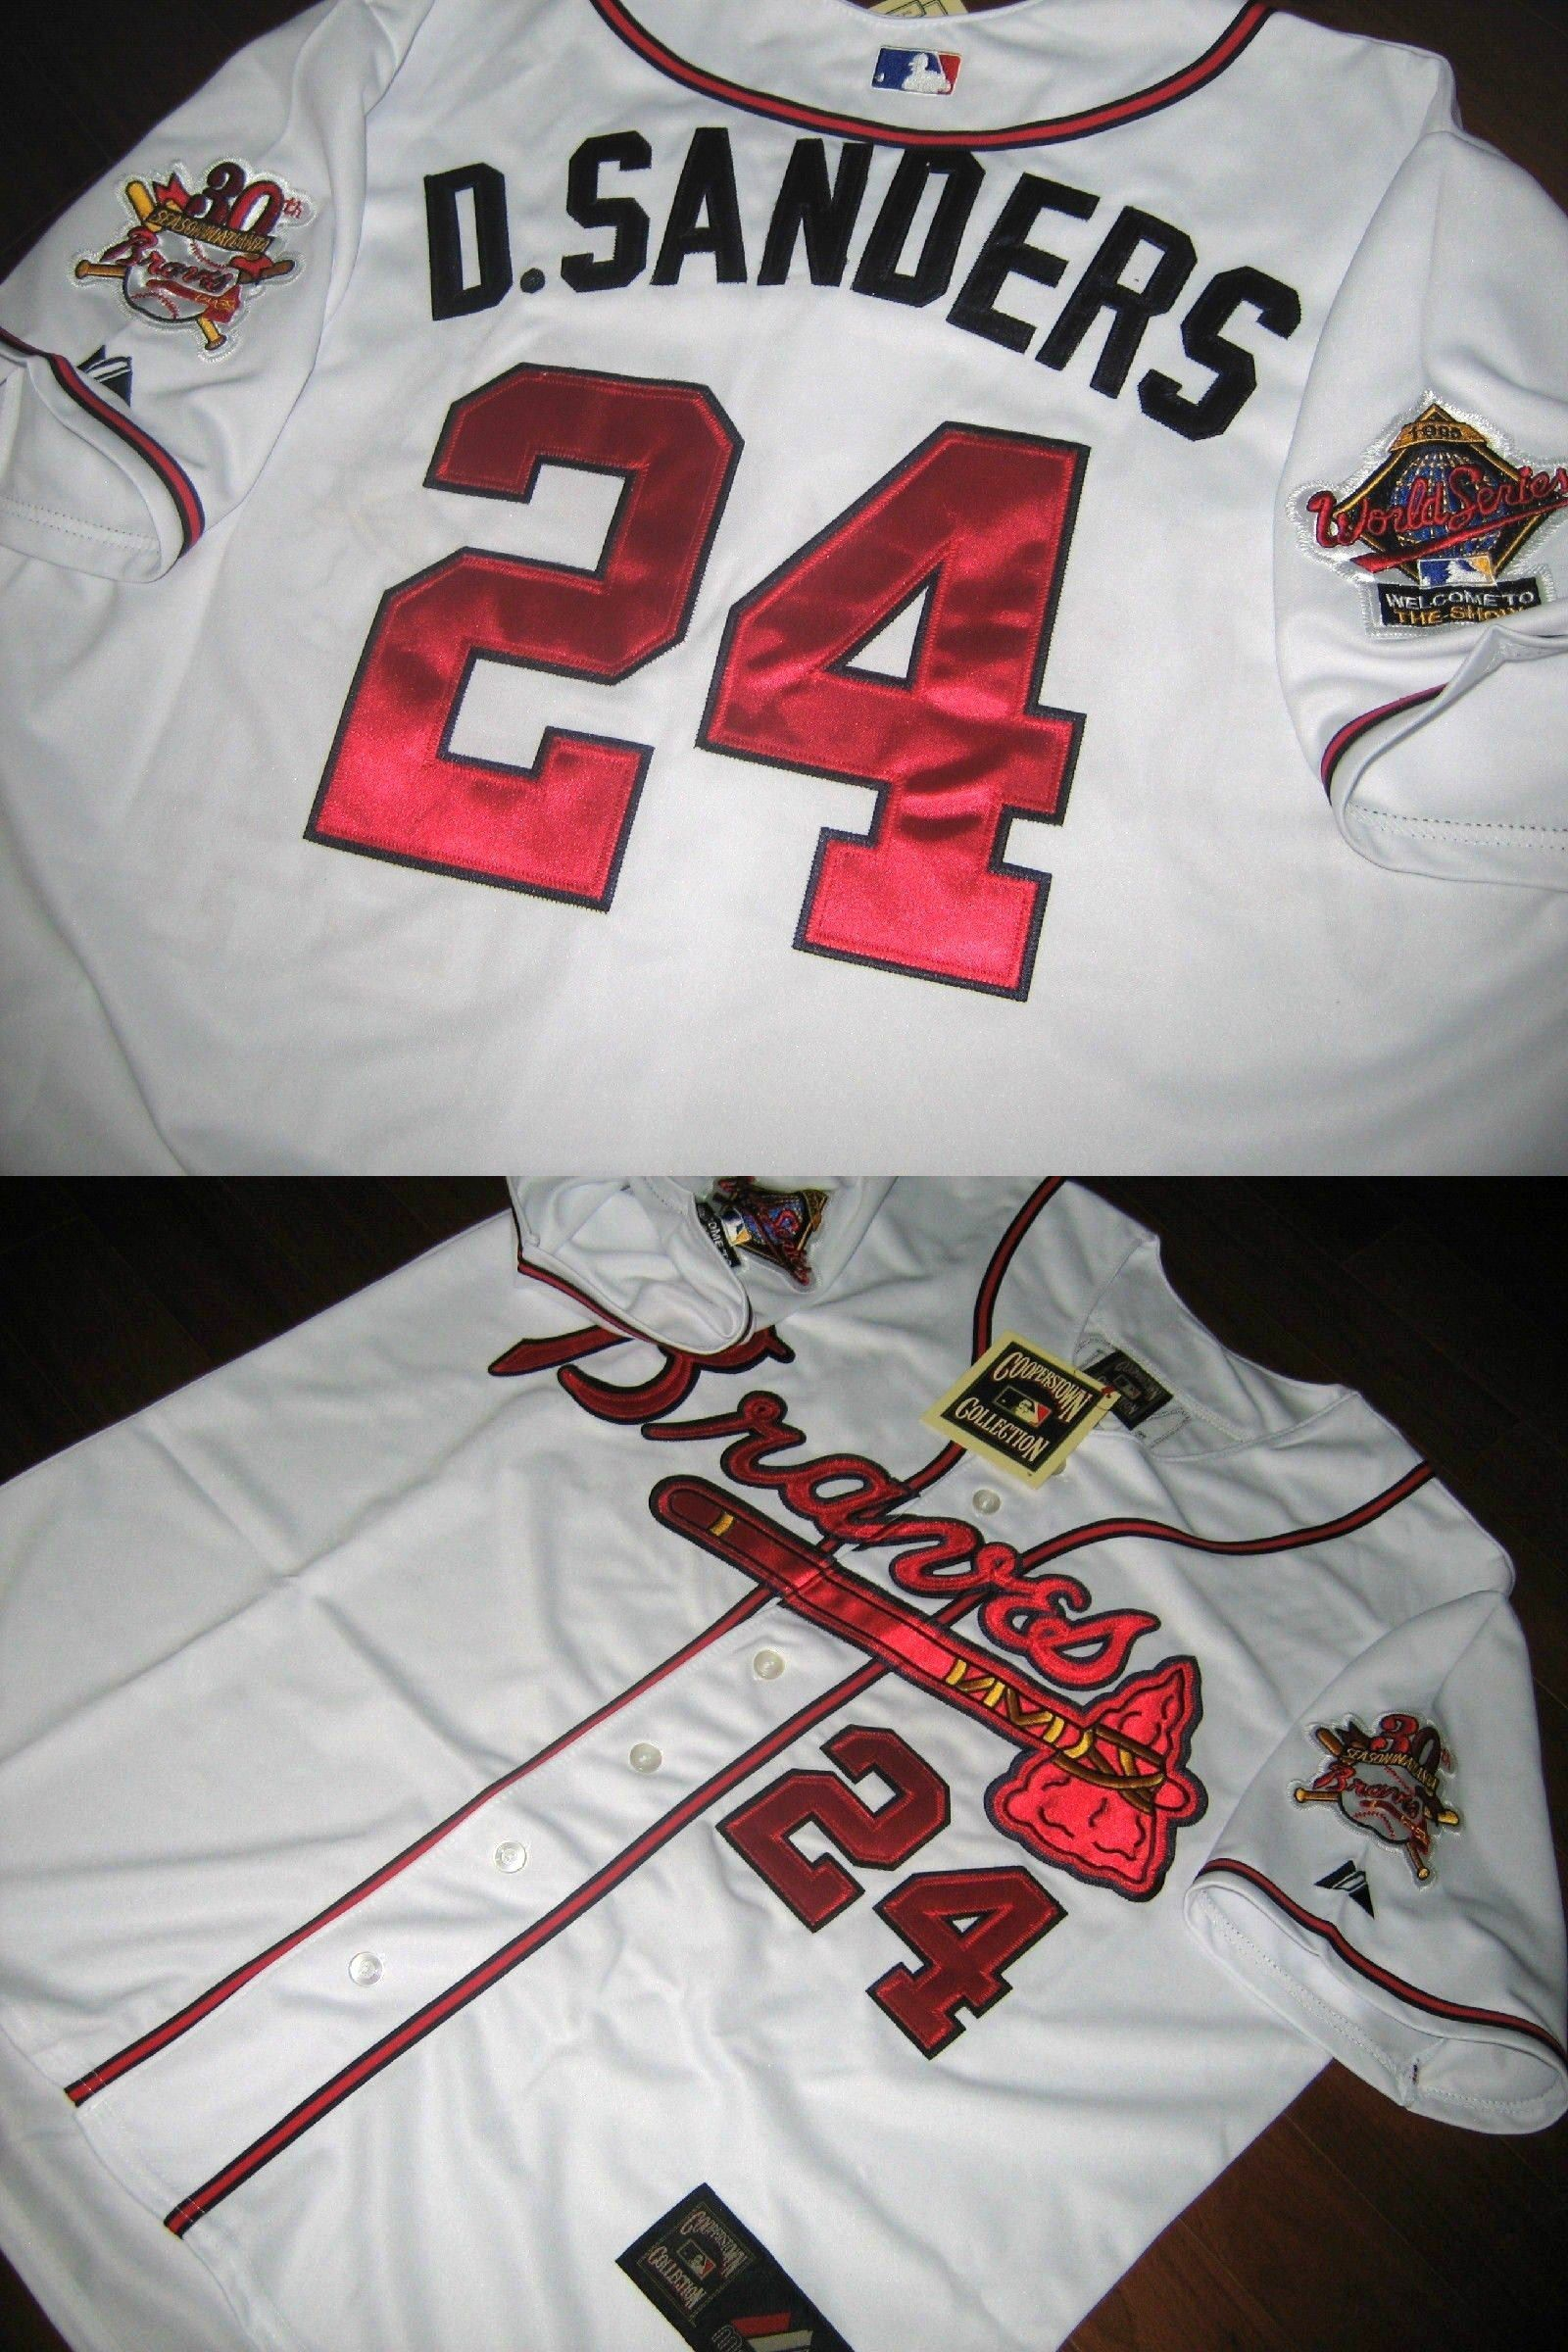 Baseball Mlb 24410 Brand New Atlanta Braves Cooperstown 24 Deion Sanders Majestic Jersey White Buy It Now Only 52 99 Mlb Baseball Atlanta Braves Braves